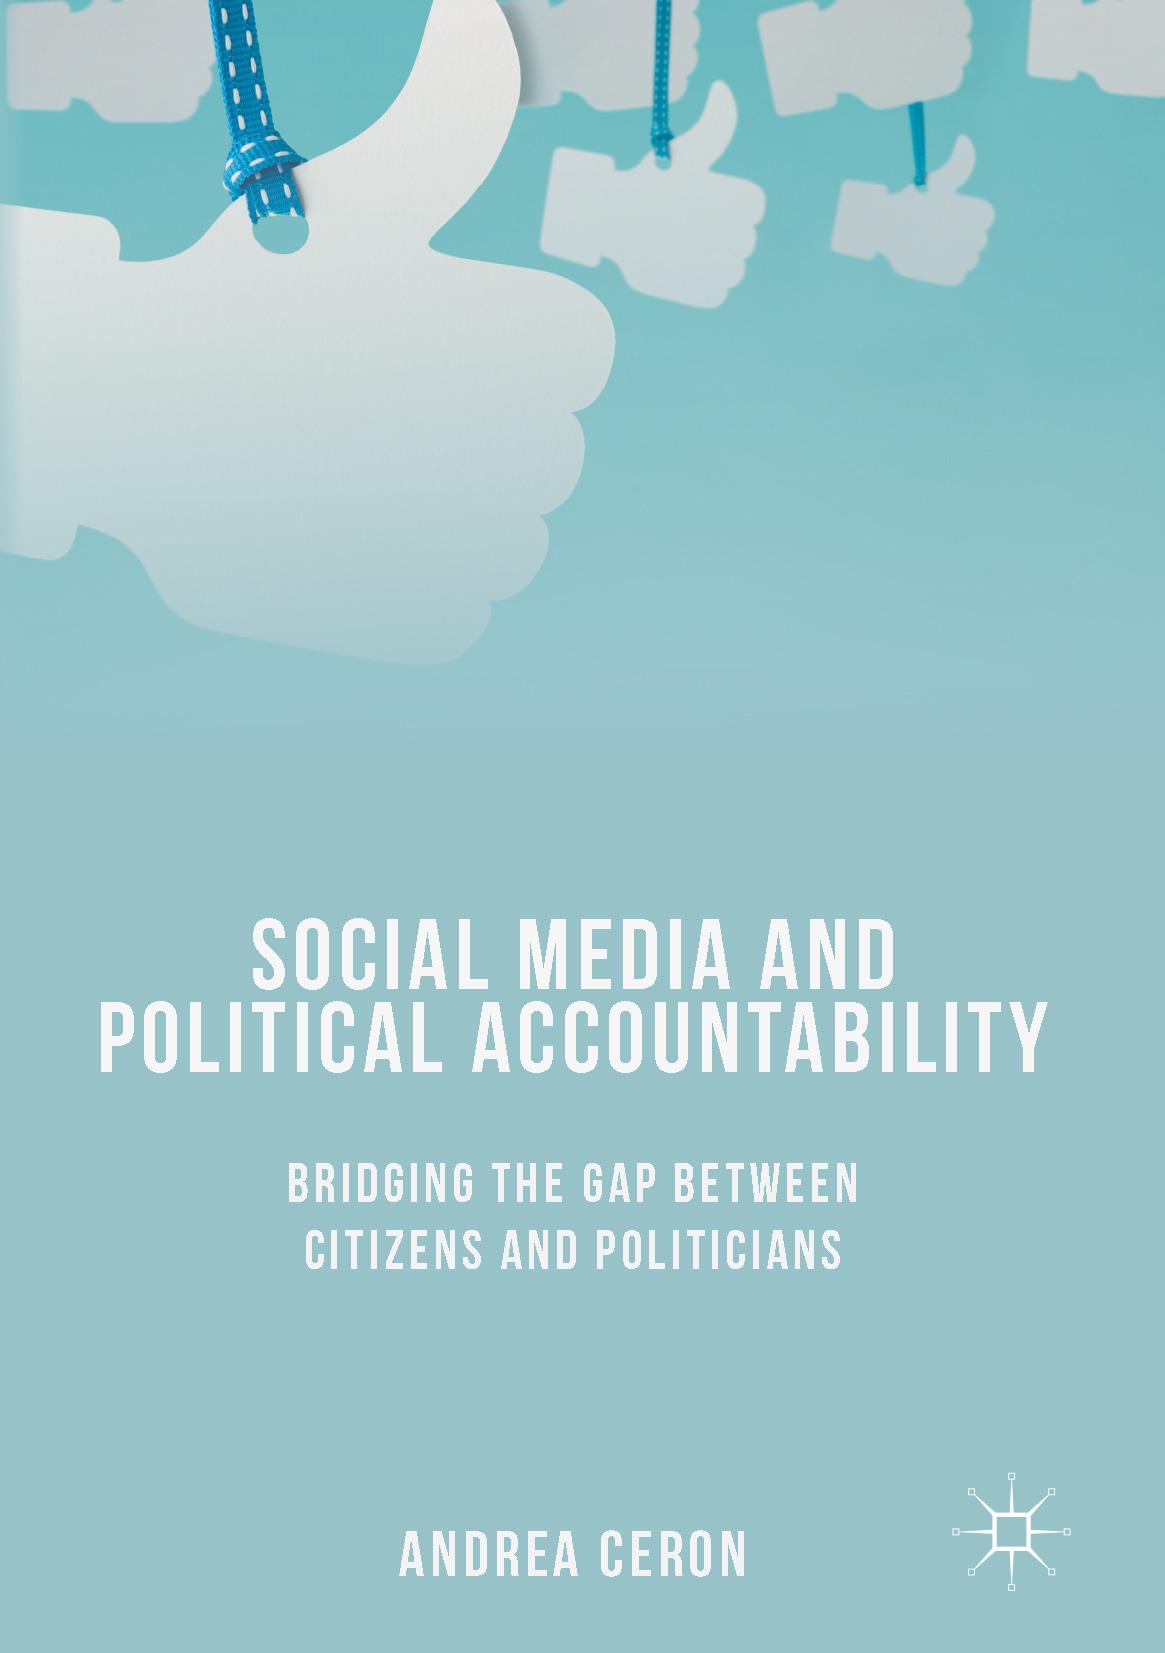 Ceron, Andrea - Social Media and Political Accountability, ebook